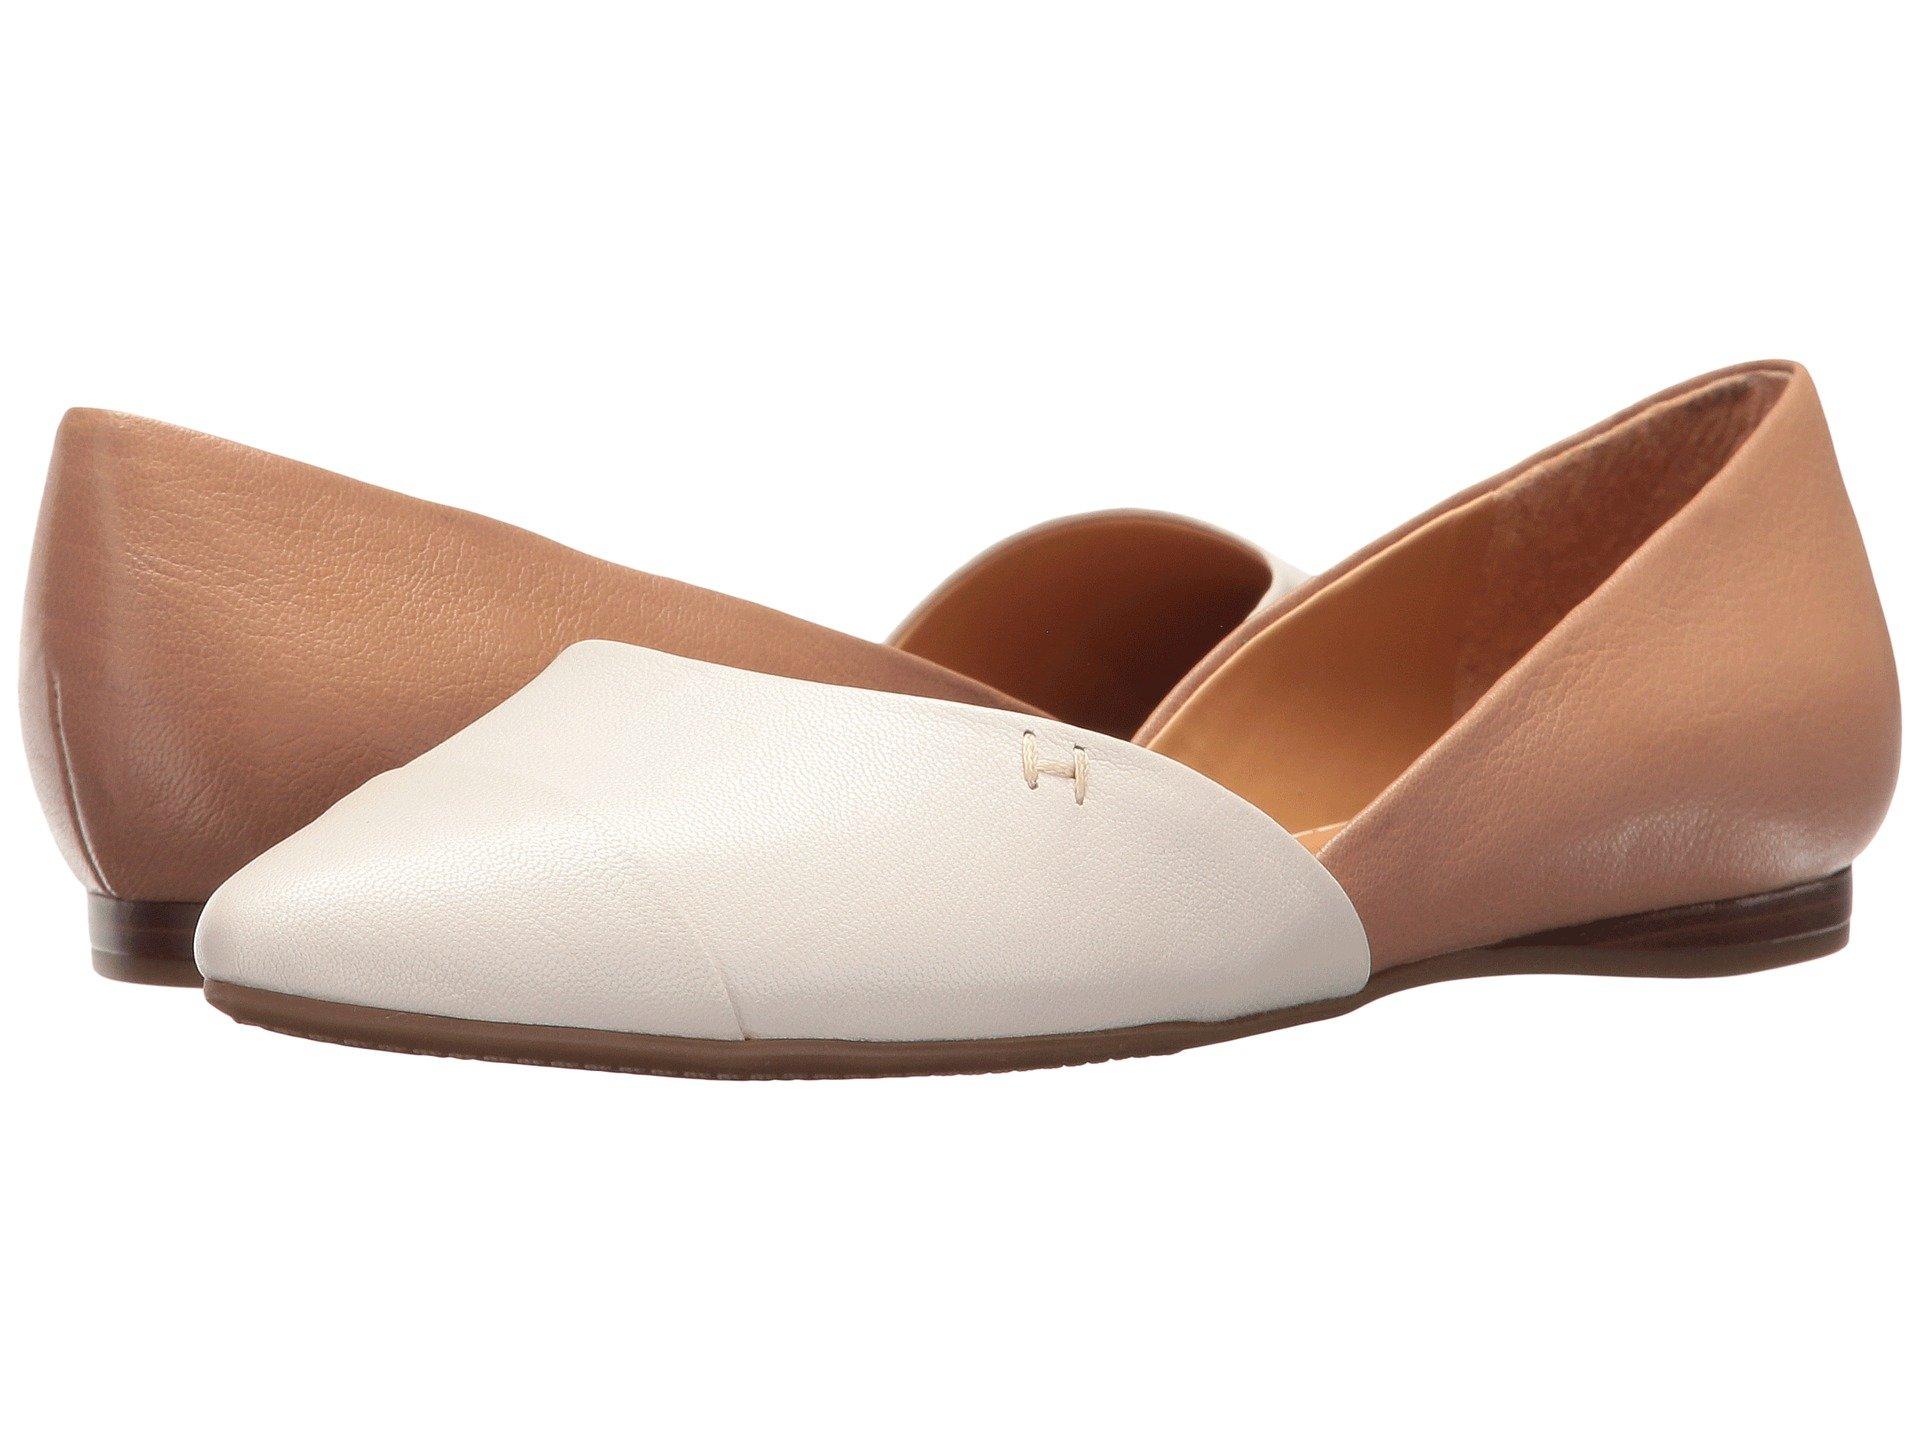 Baletas para Mujer Tommy Hilfiger Narcee  + Tommy Hilfiger en VeoyCompro.net